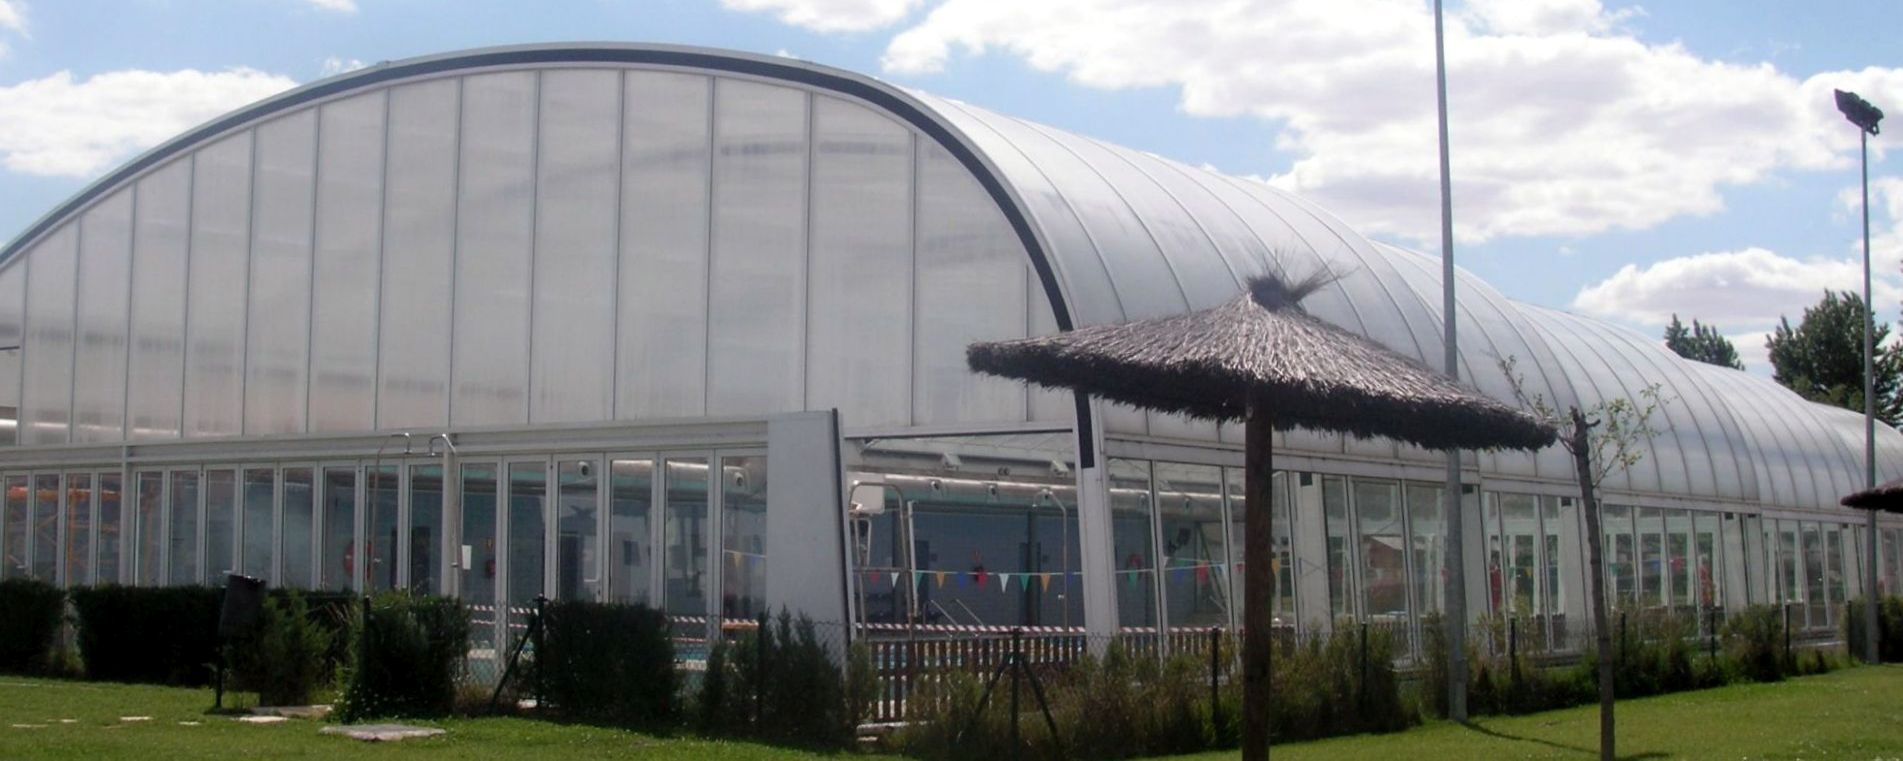 Dreamcover acoperiri profesionale de piscine for Acoperiri piscine